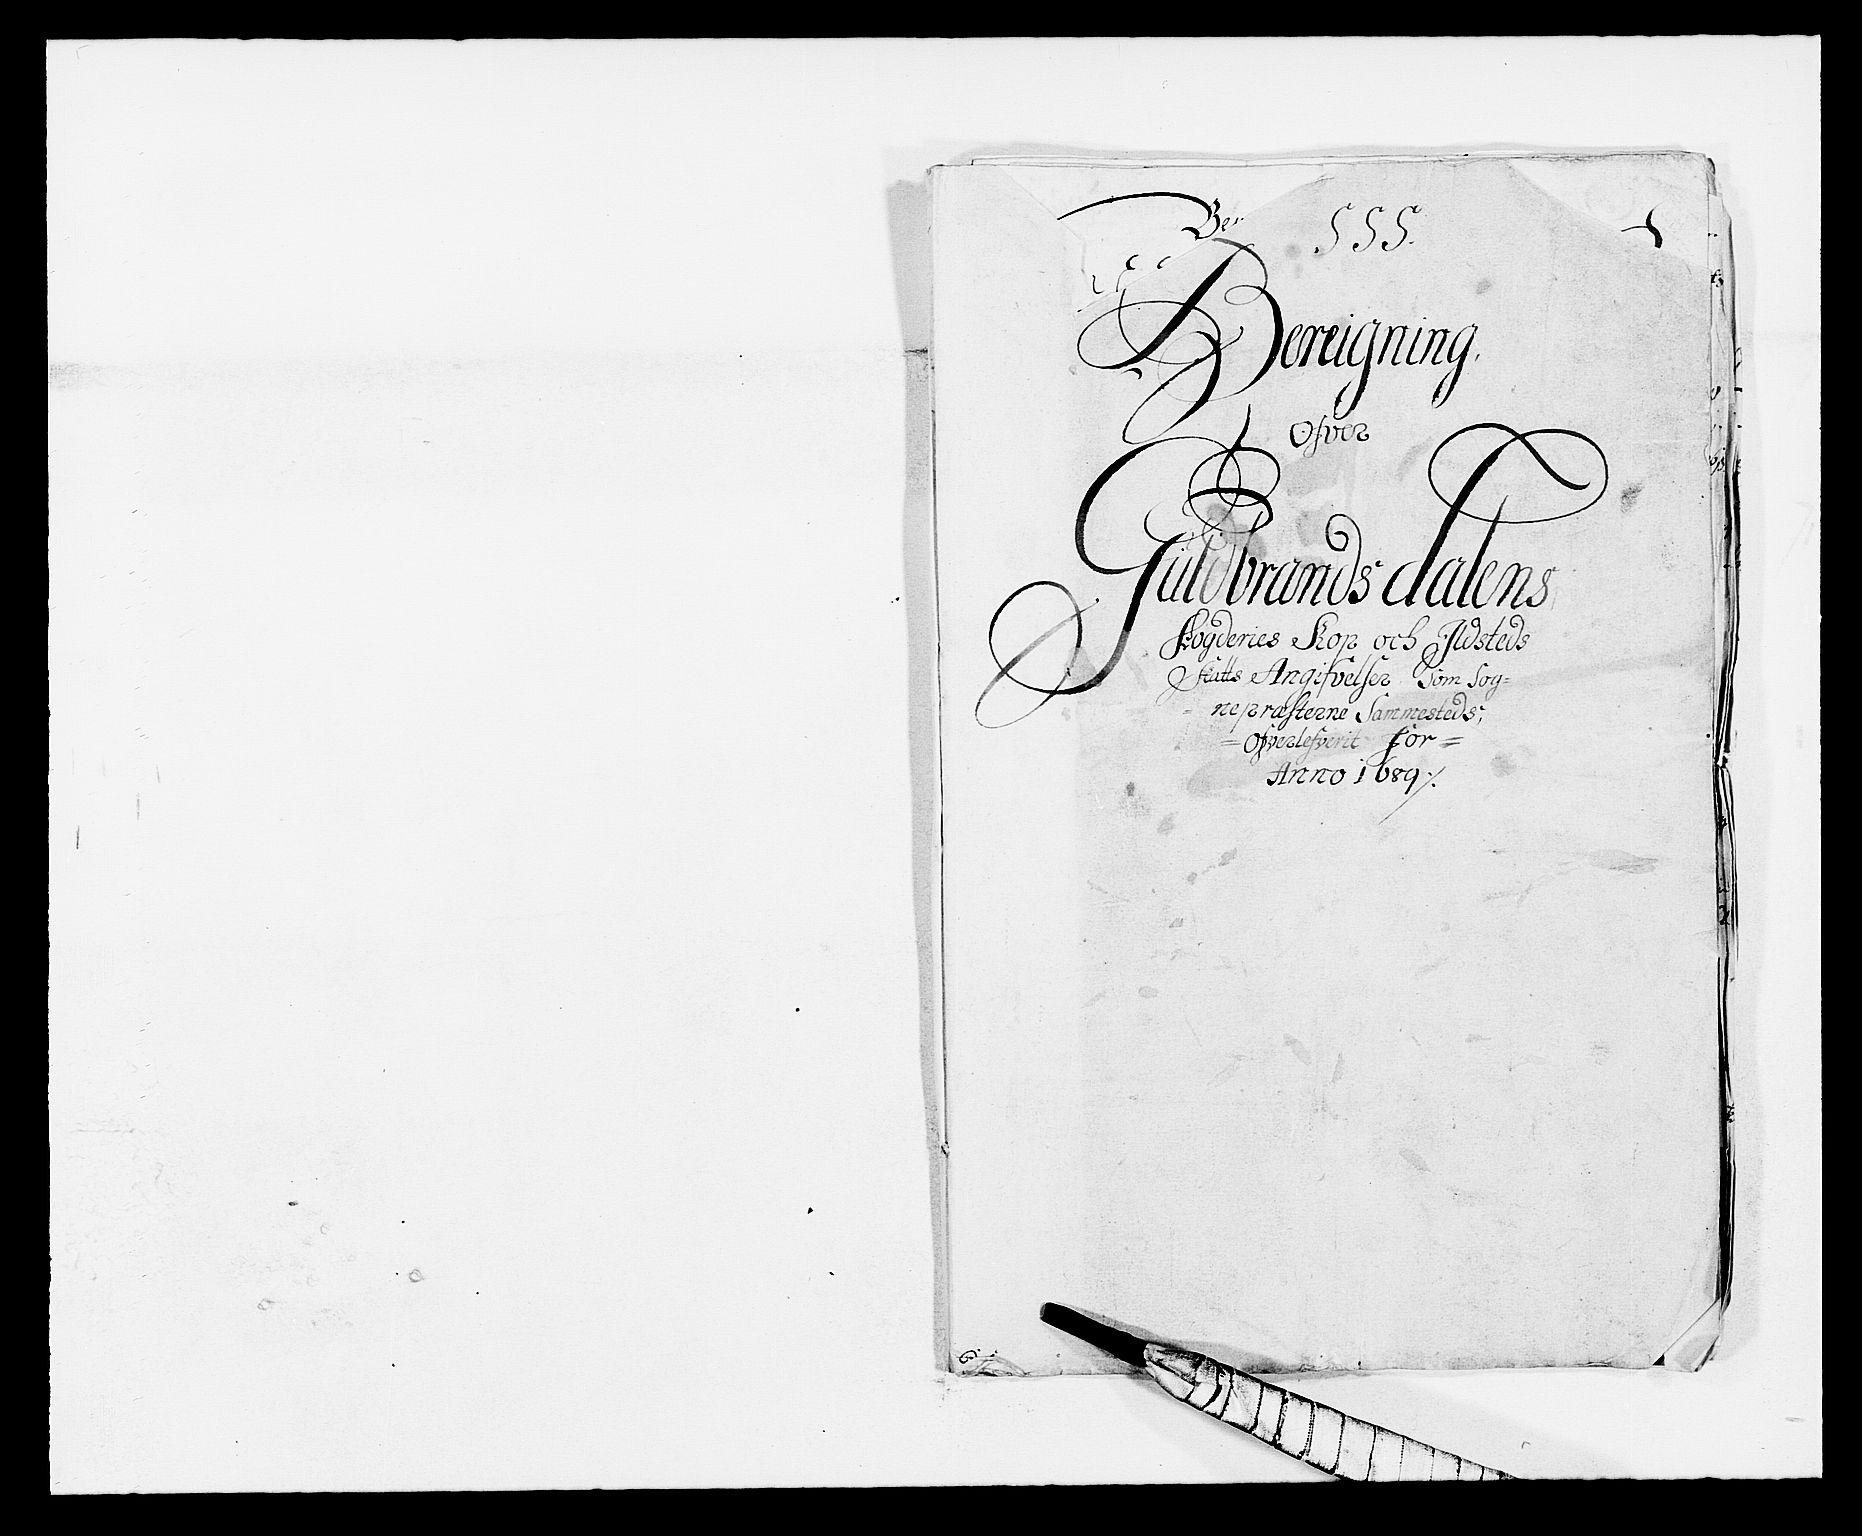 RA, Rentekammeret inntil 1814, Reviderte regnskaper, Fogderegnskap, R17/L1164: Fogderegnskap Gudbrandsdal, 1682-1689, s. 153